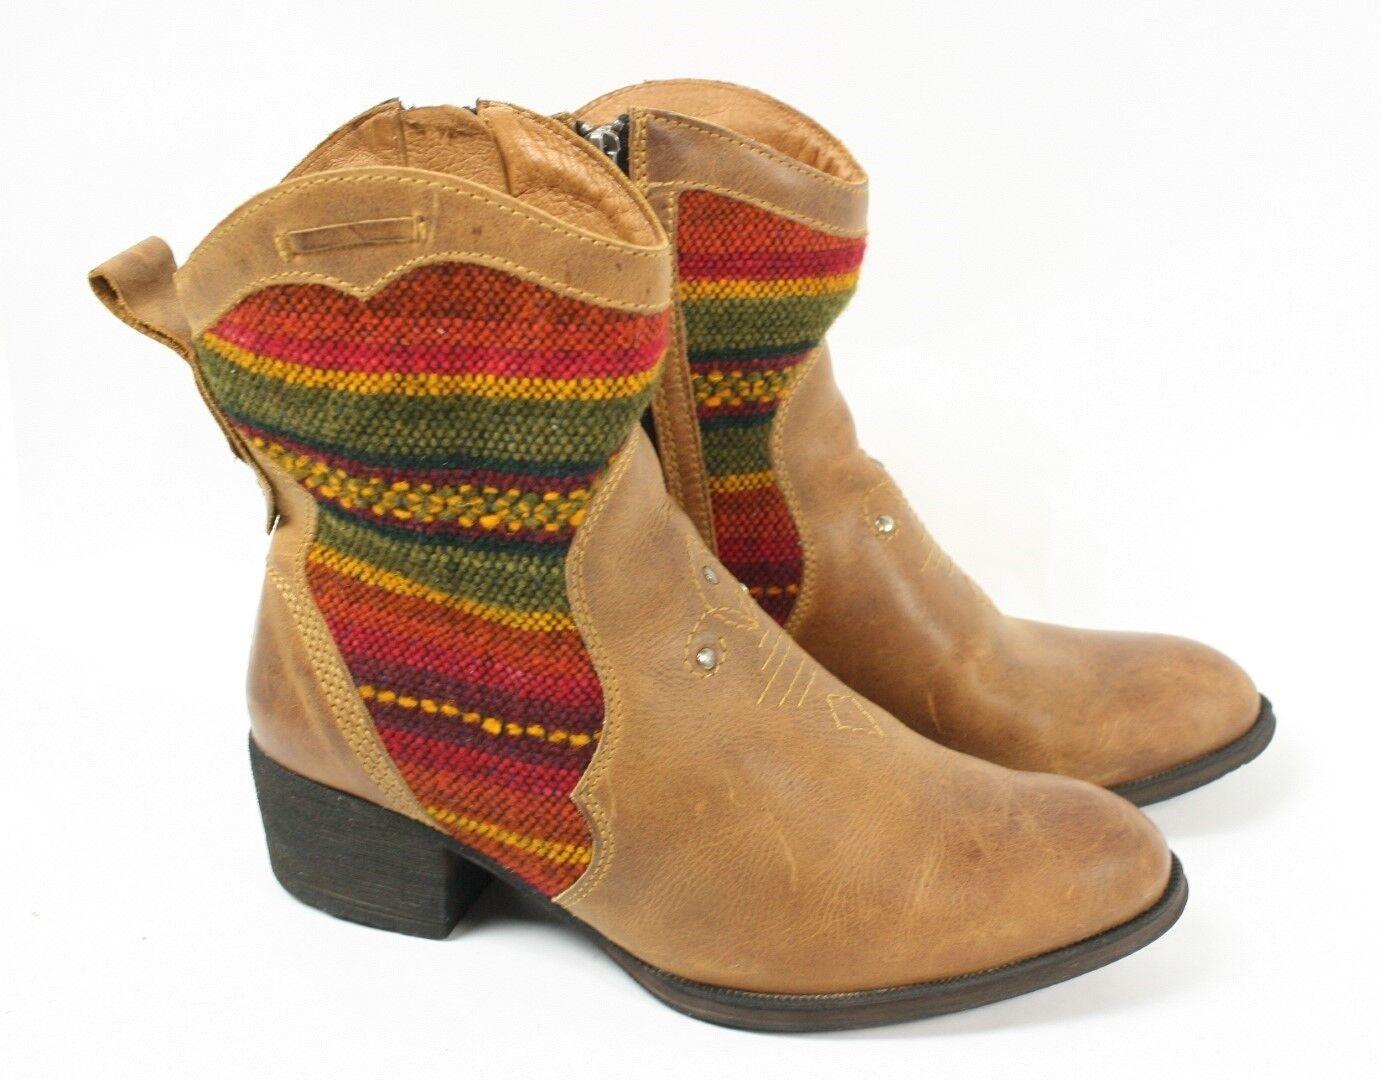 BORN Topanga Braun Multi Farbe Calf Knit Short Western Mid Calf Farbe Ankle Stiefel Damens 9.5 1fecf8